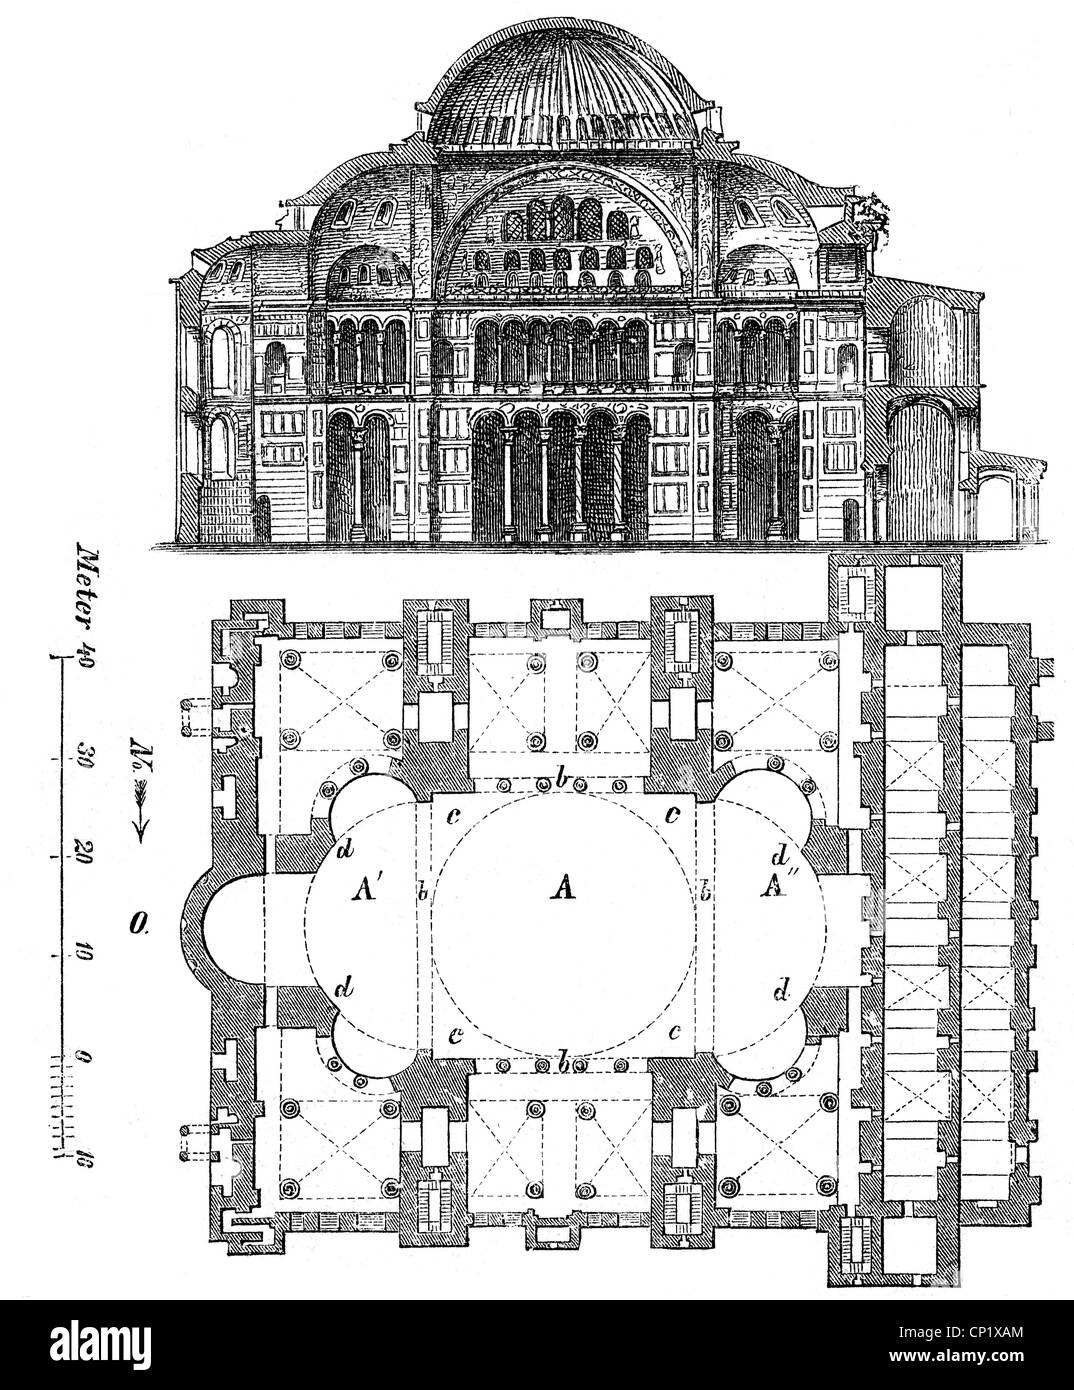 Furniture Templates For Floor Plans Architecture Ground Plans Hagia Sophia Istanbul Built